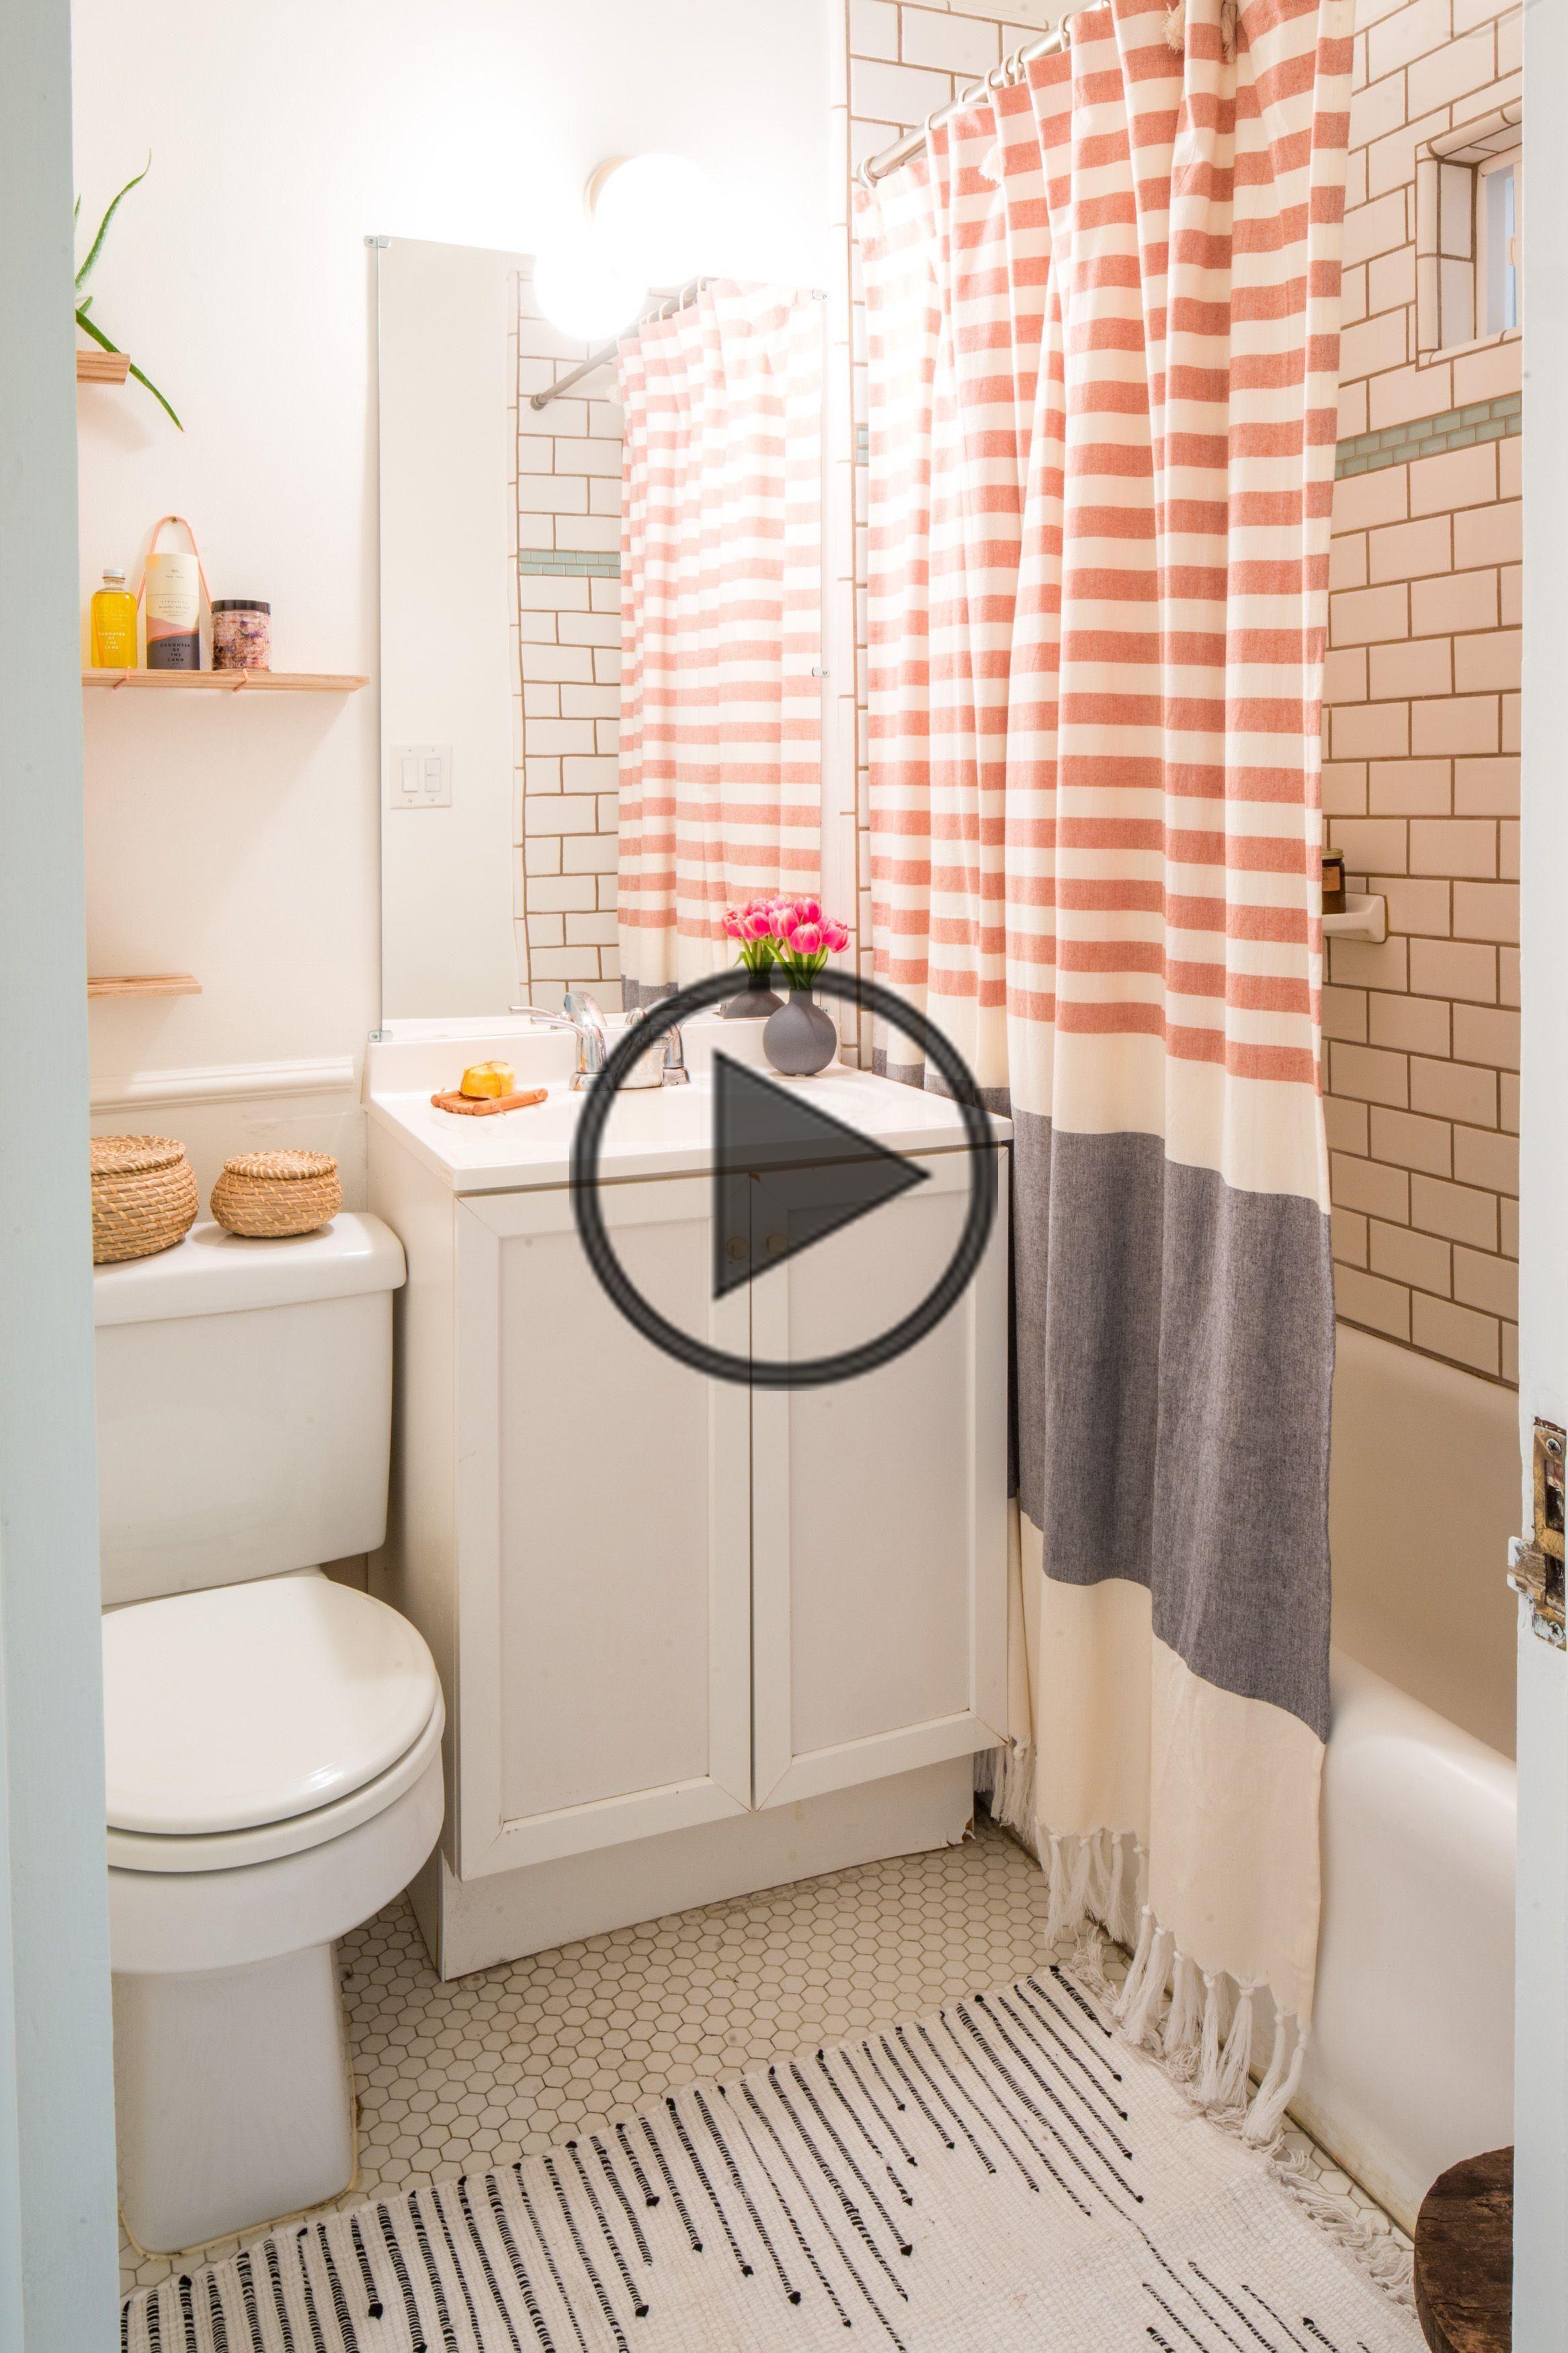 25 Genius Design Storage Ideas For Your Small Bathroom In 2020 Bathroom Design Small Color Bathroom Design Bathroom Shower Curtains